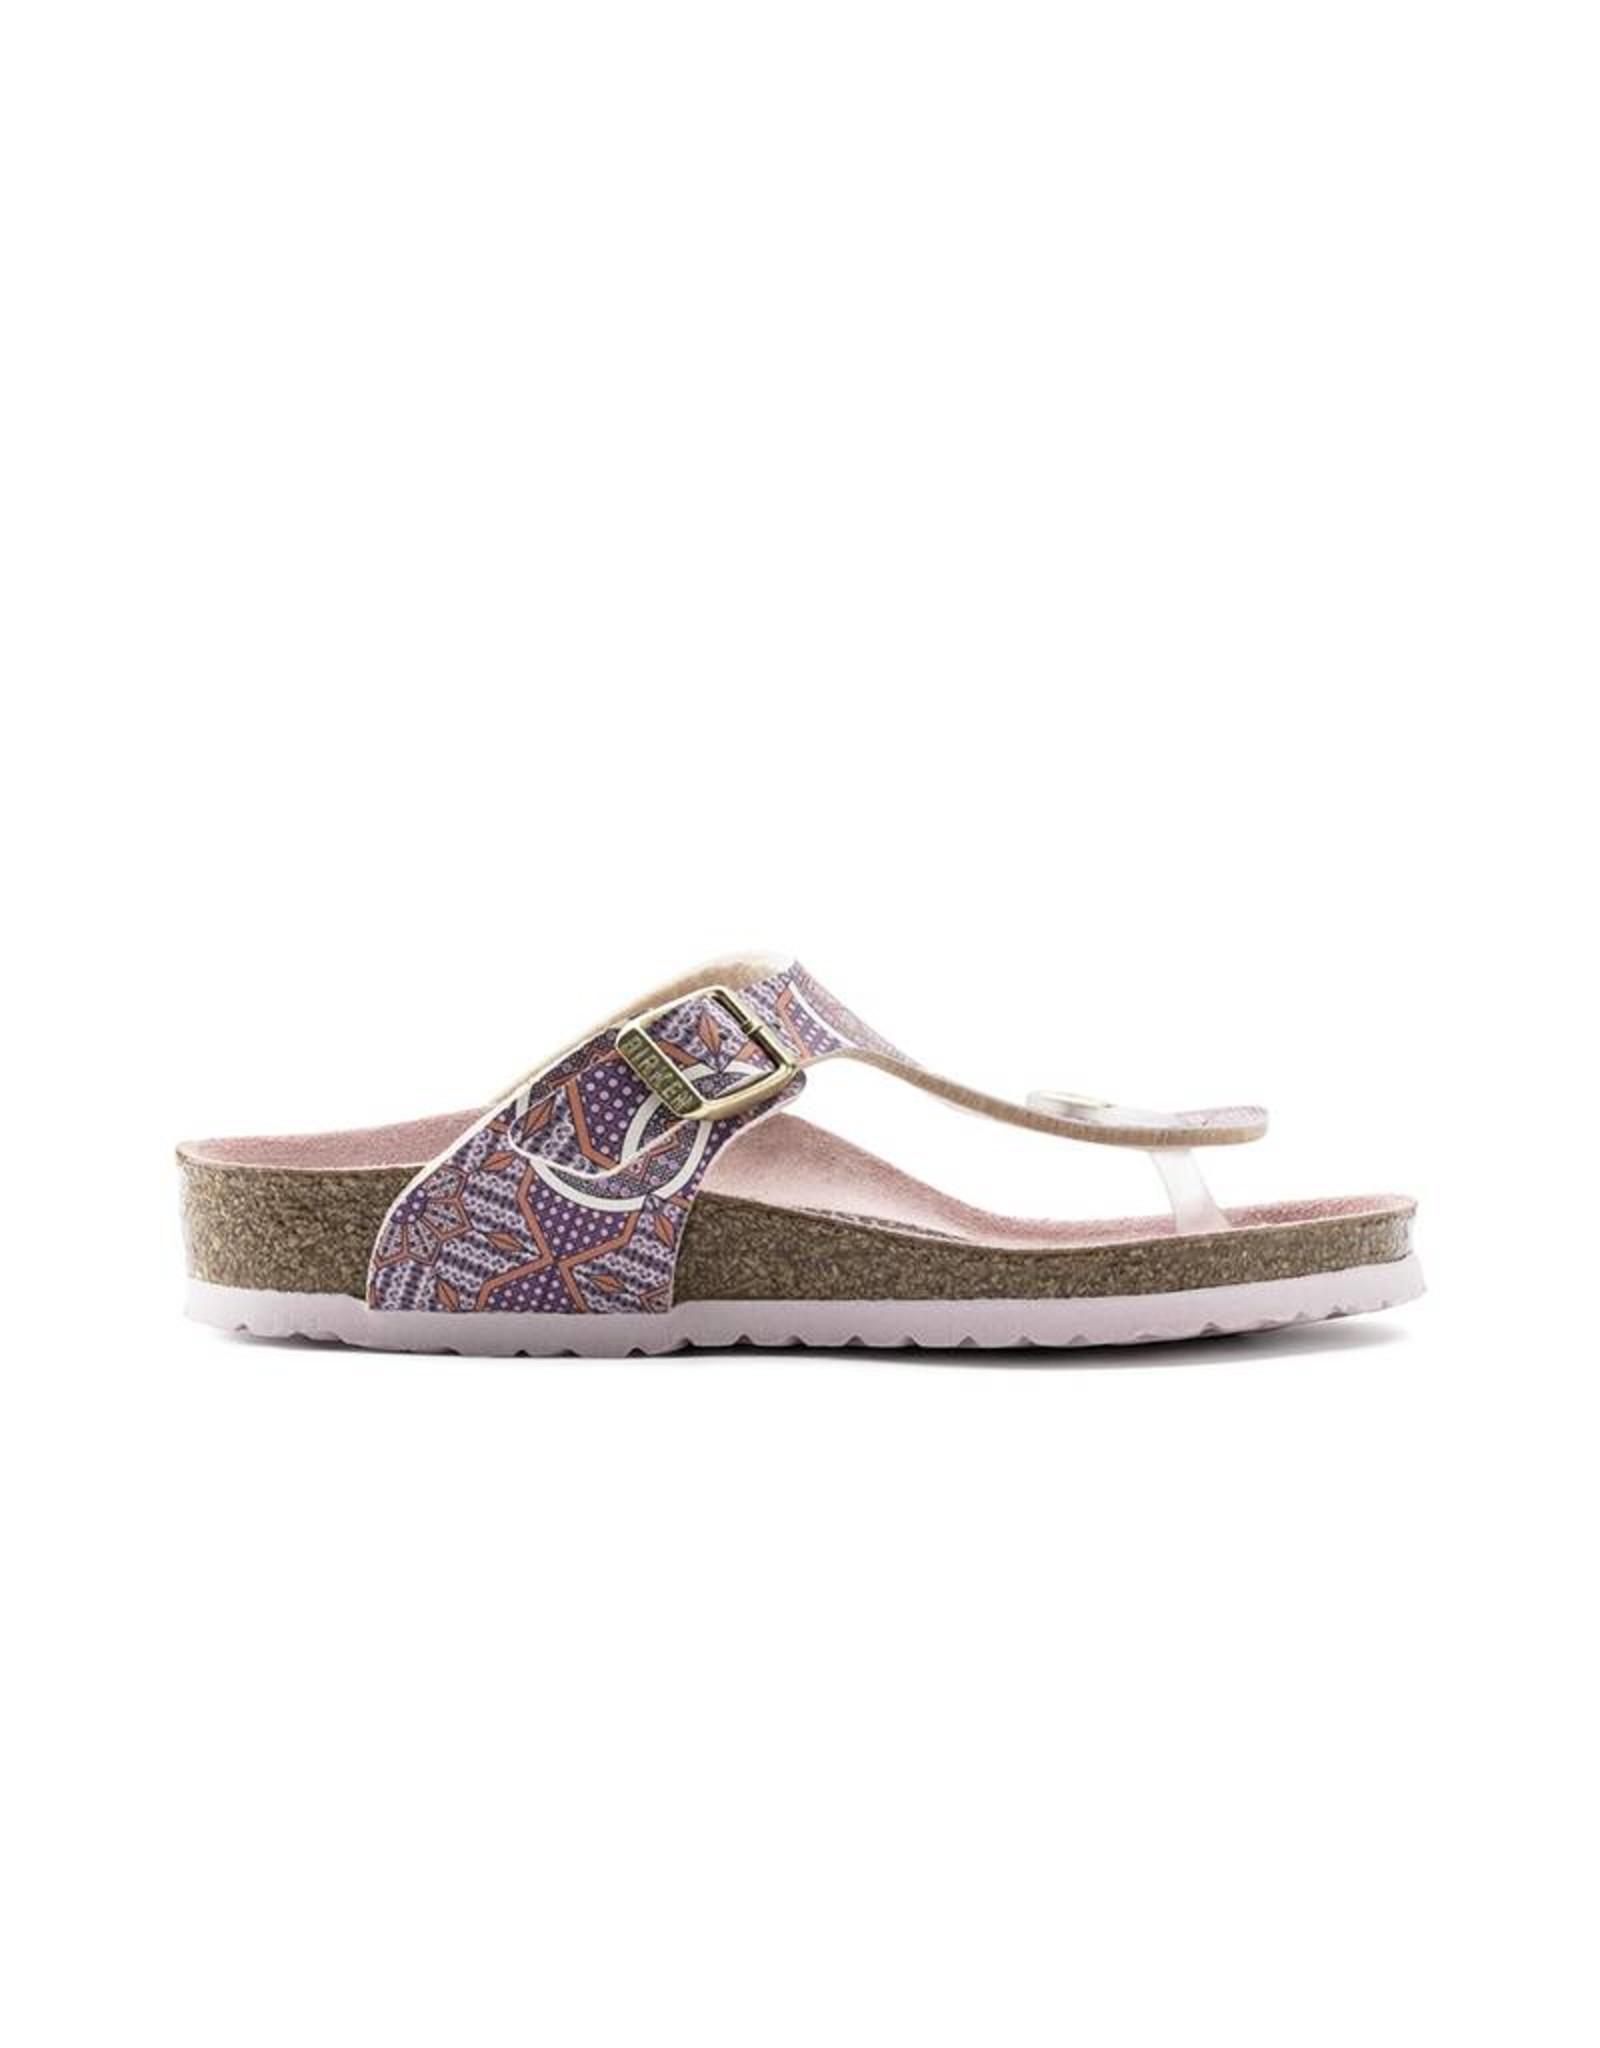 Birkenstock Gizeh Kids - Birko-Flor in Oriental Tiles Rose (Classic Footbed - Suede Lined)